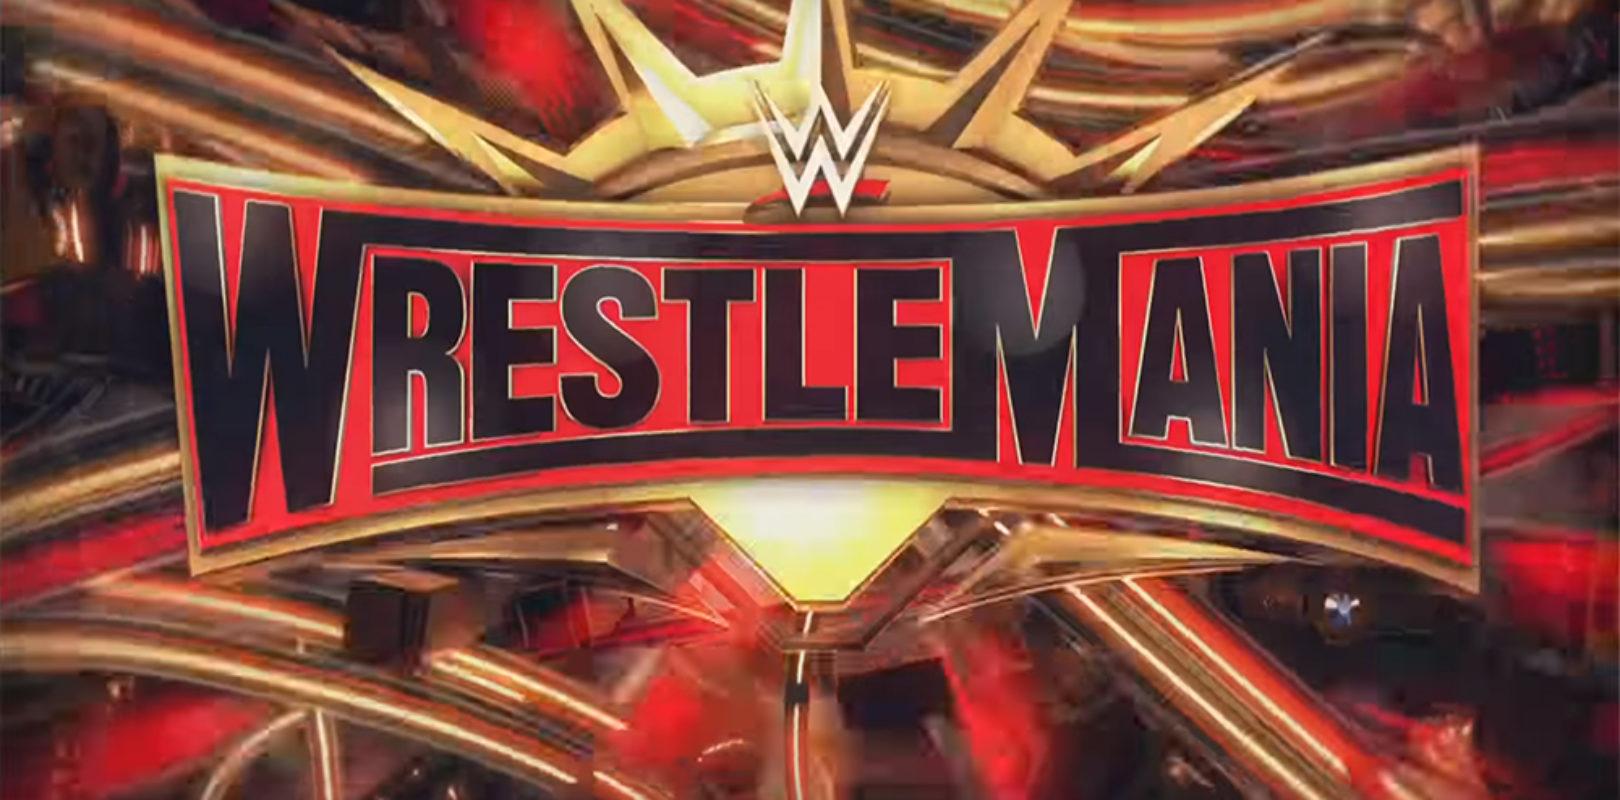 Wrestlemania 35 predictions